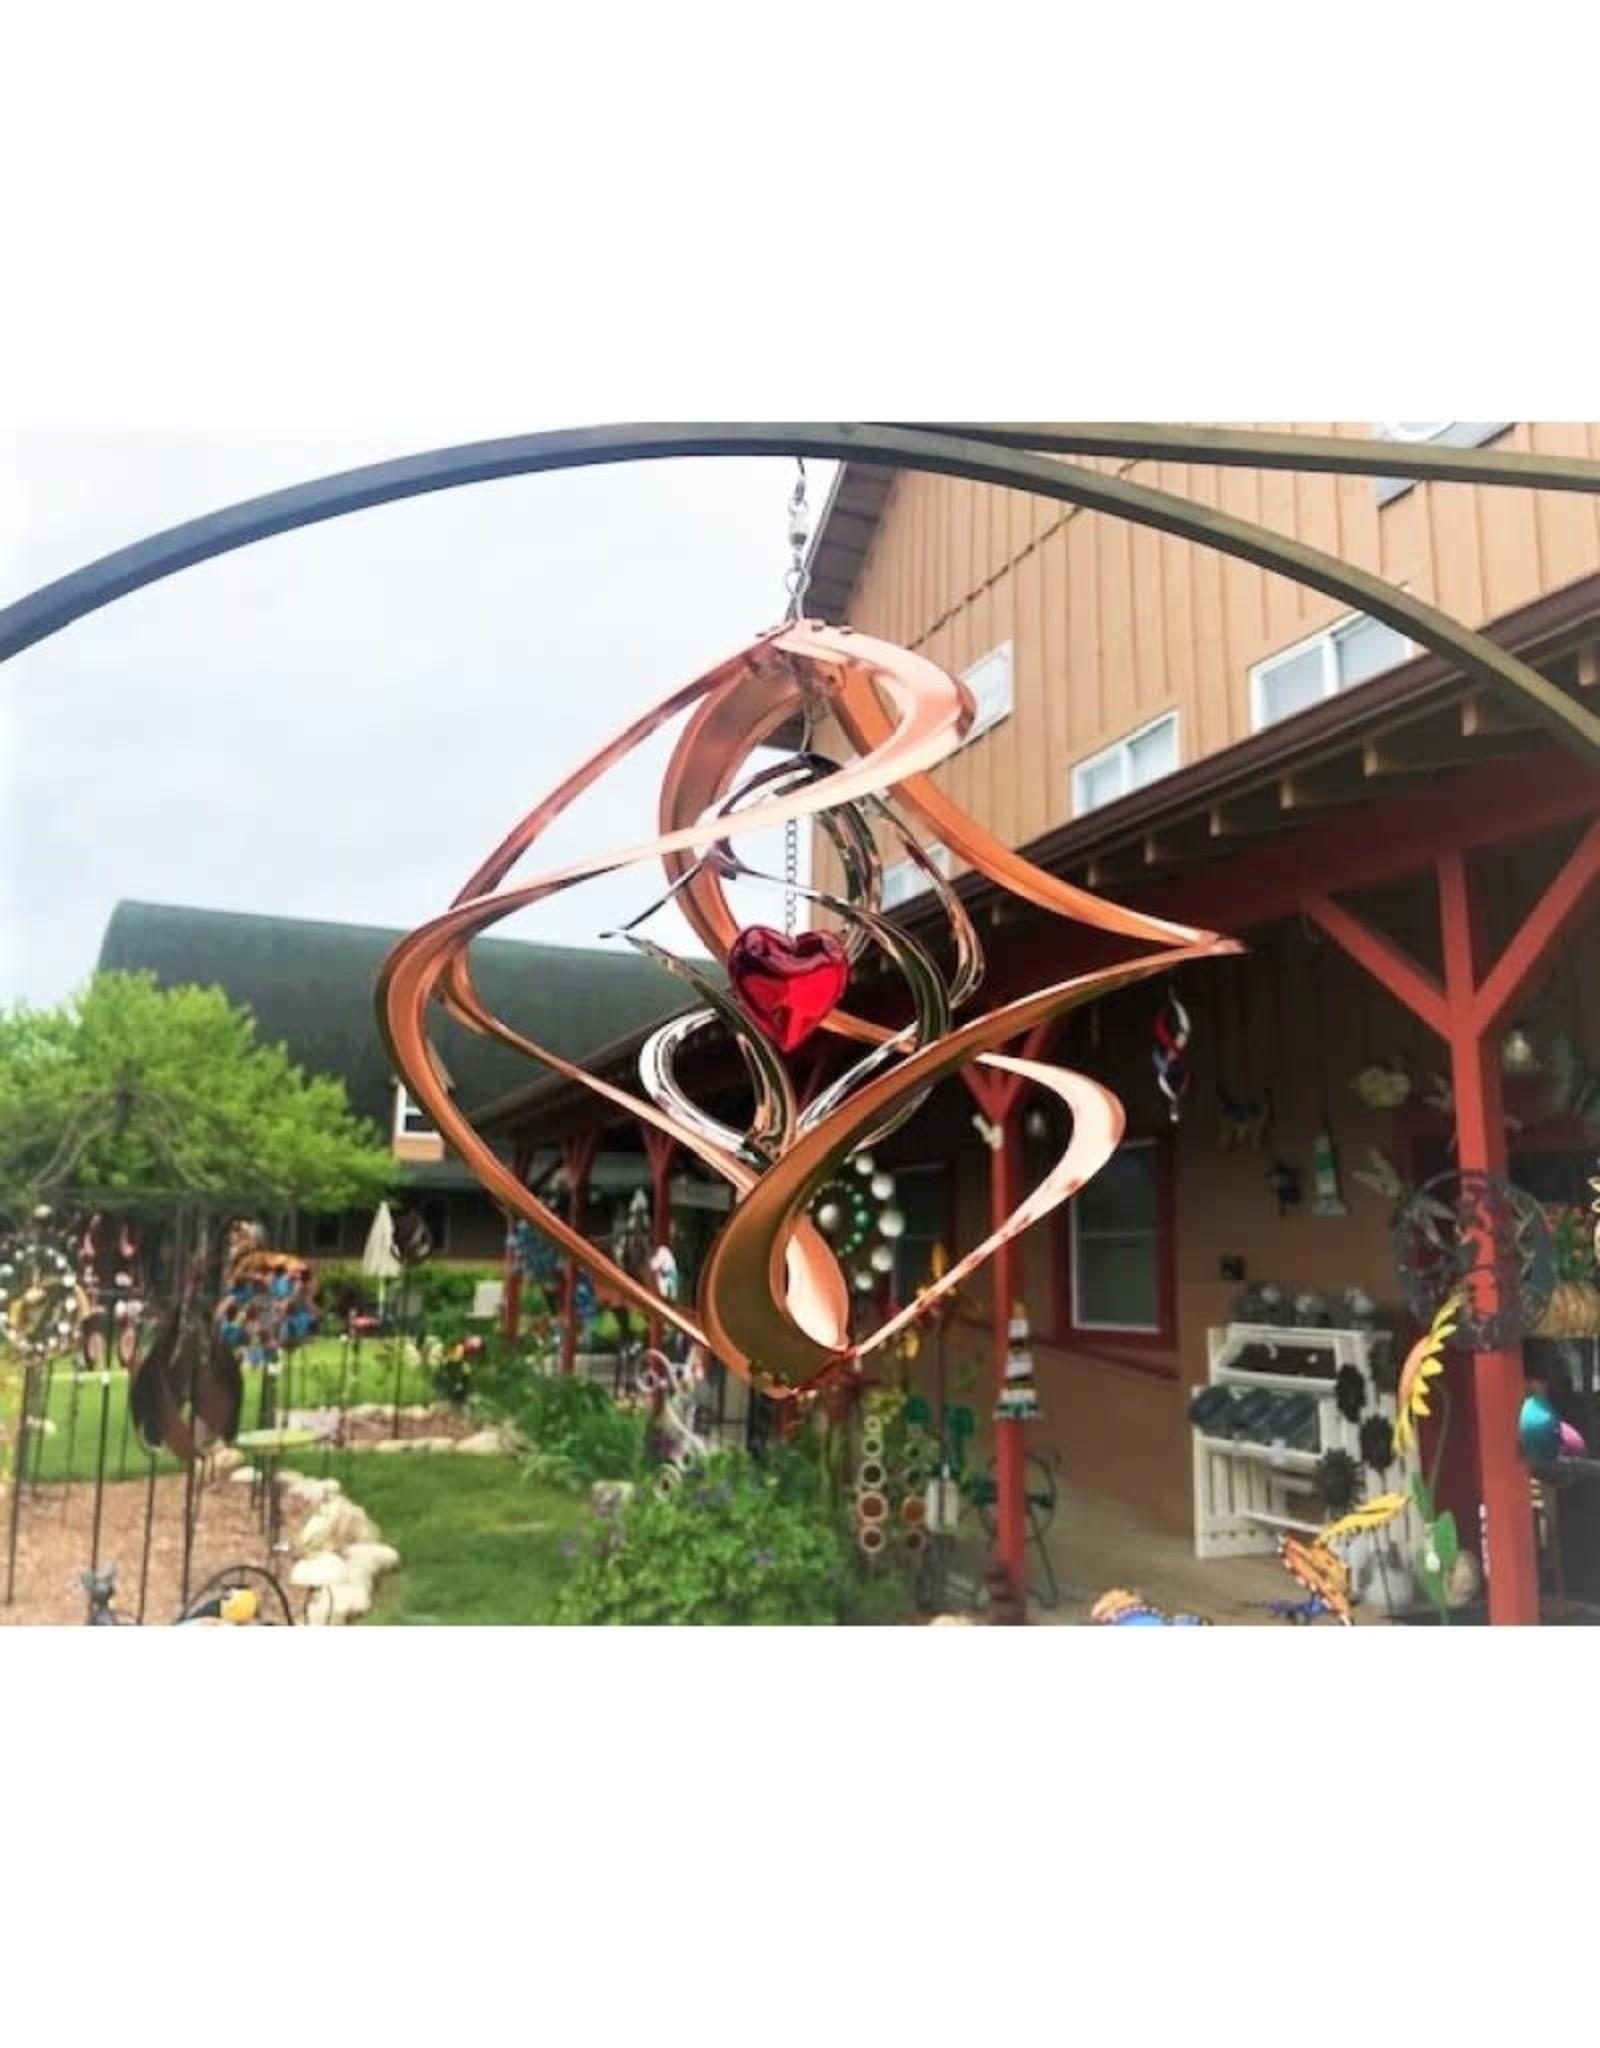 Bear Den Helix Hanging Helix - 14 inch Copper & Red Heart